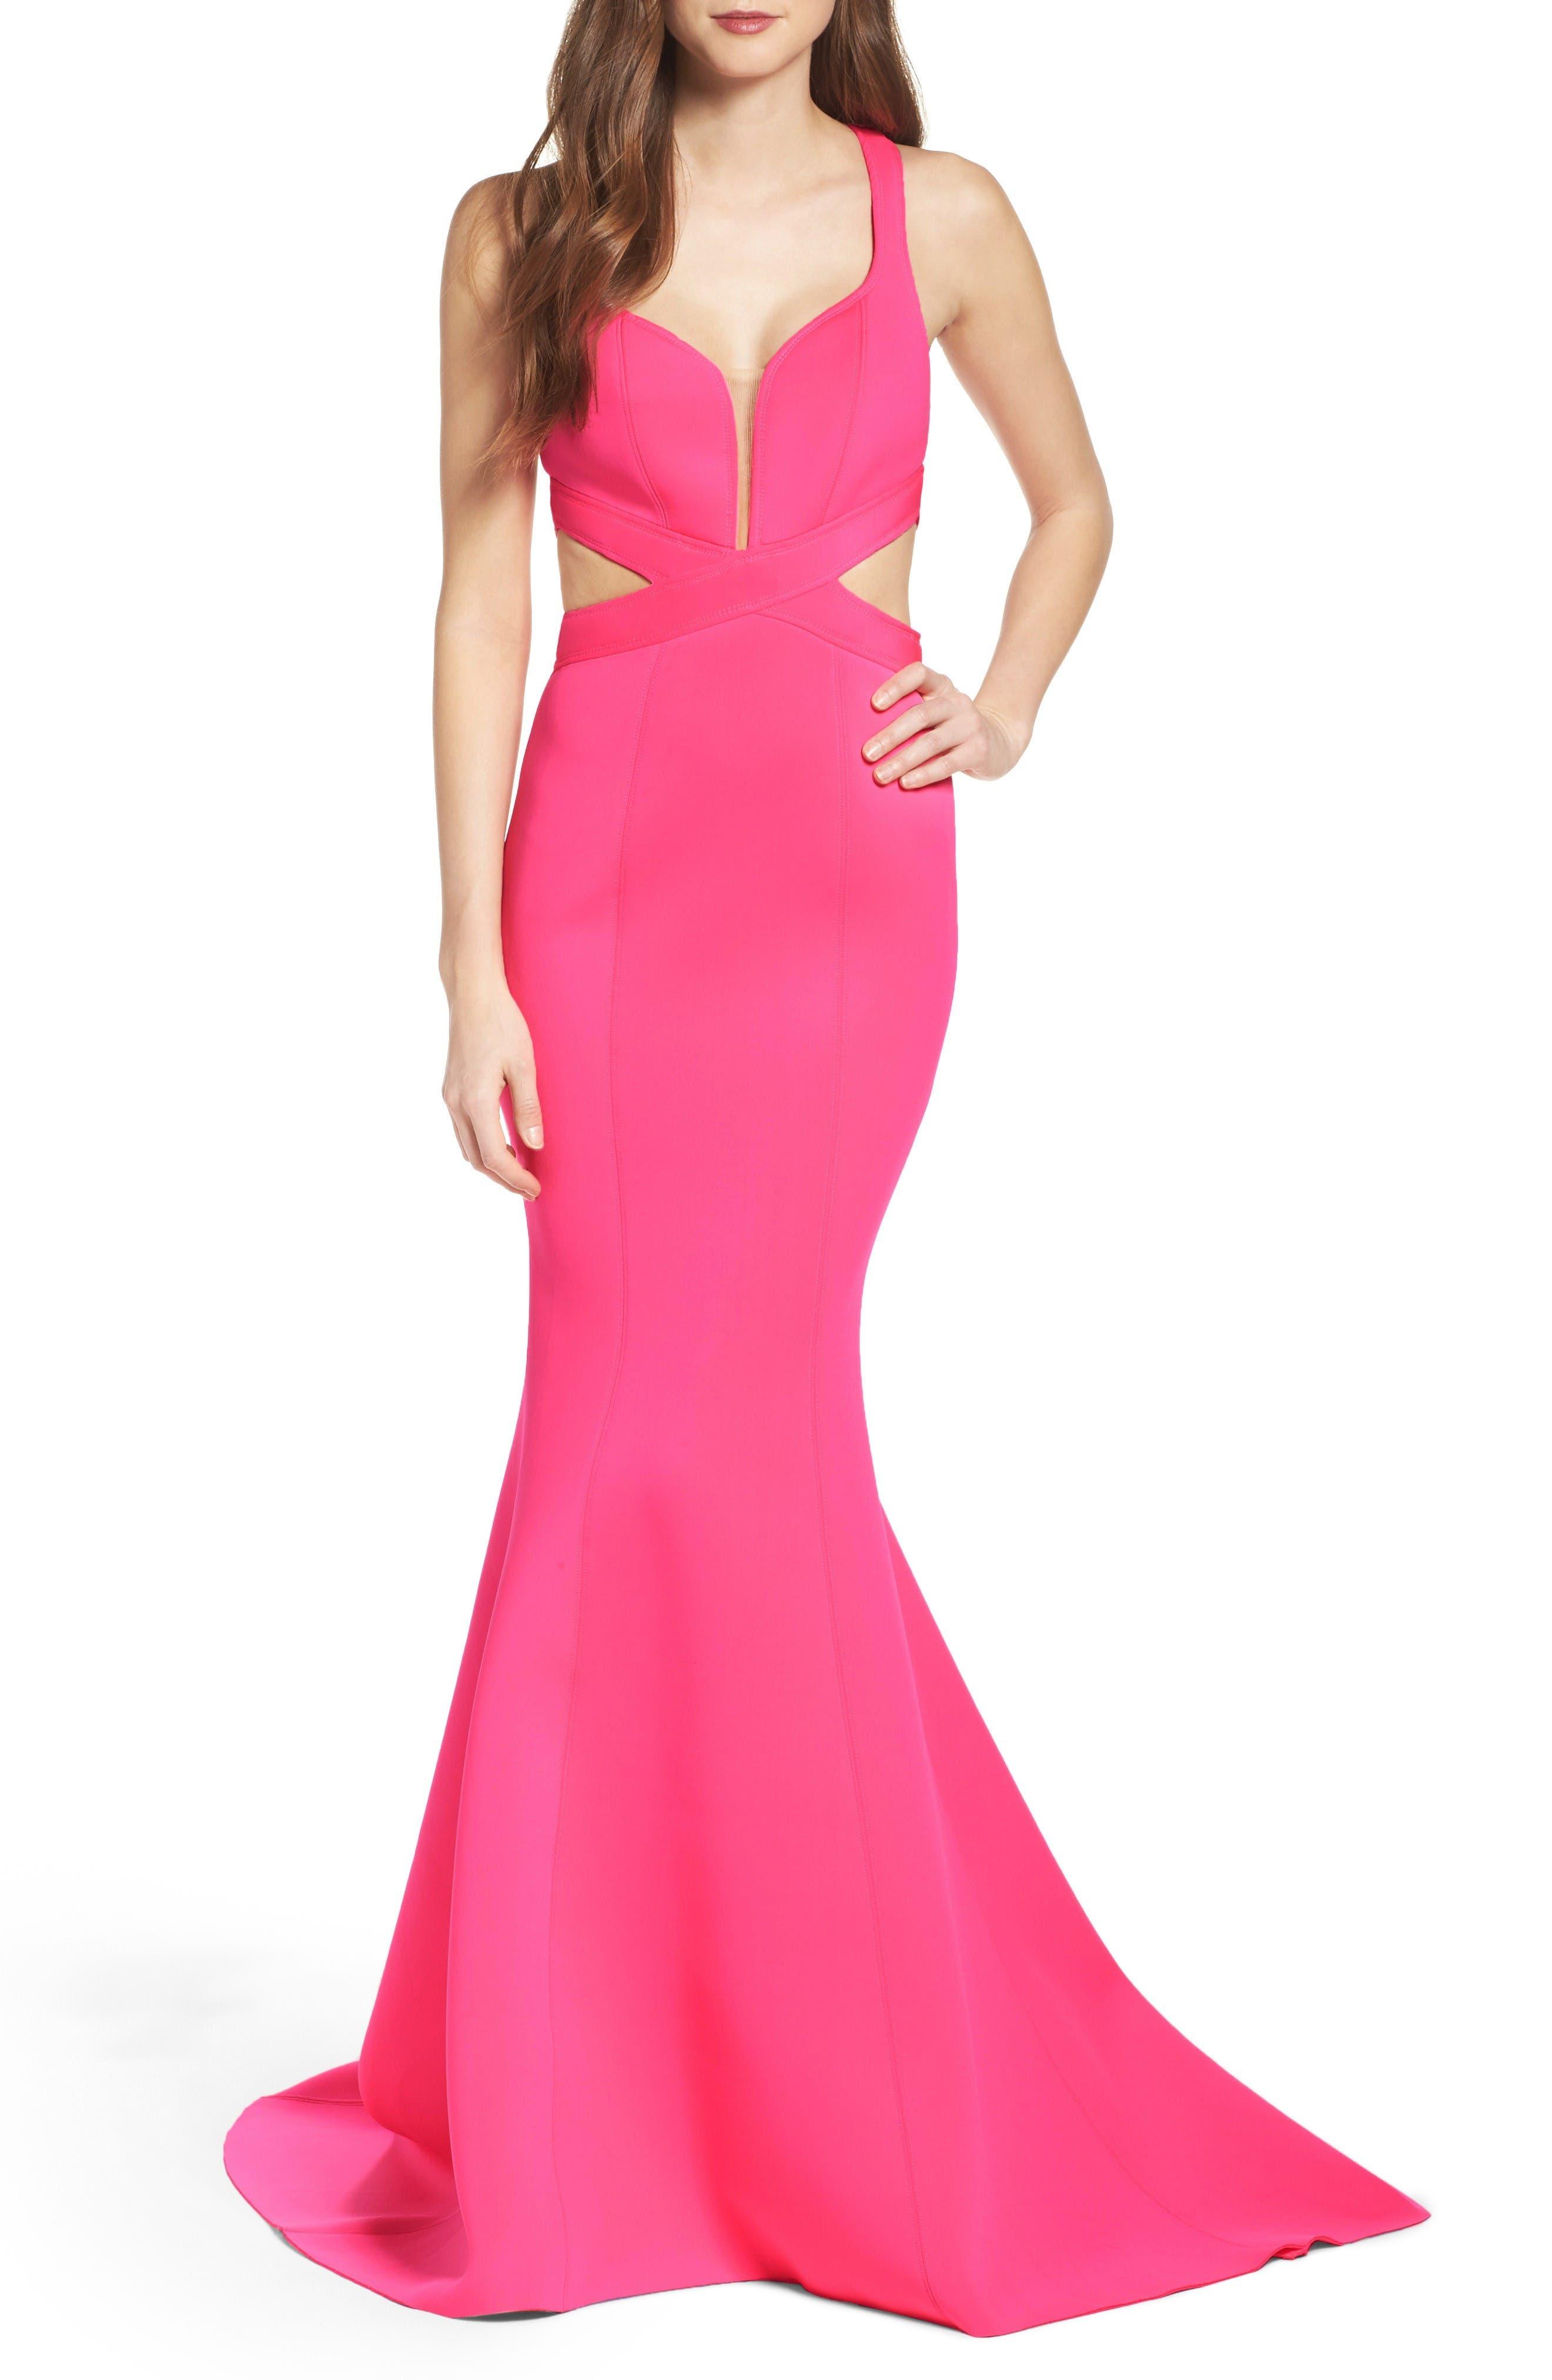 La Femme Neoprene Mermaid Gown